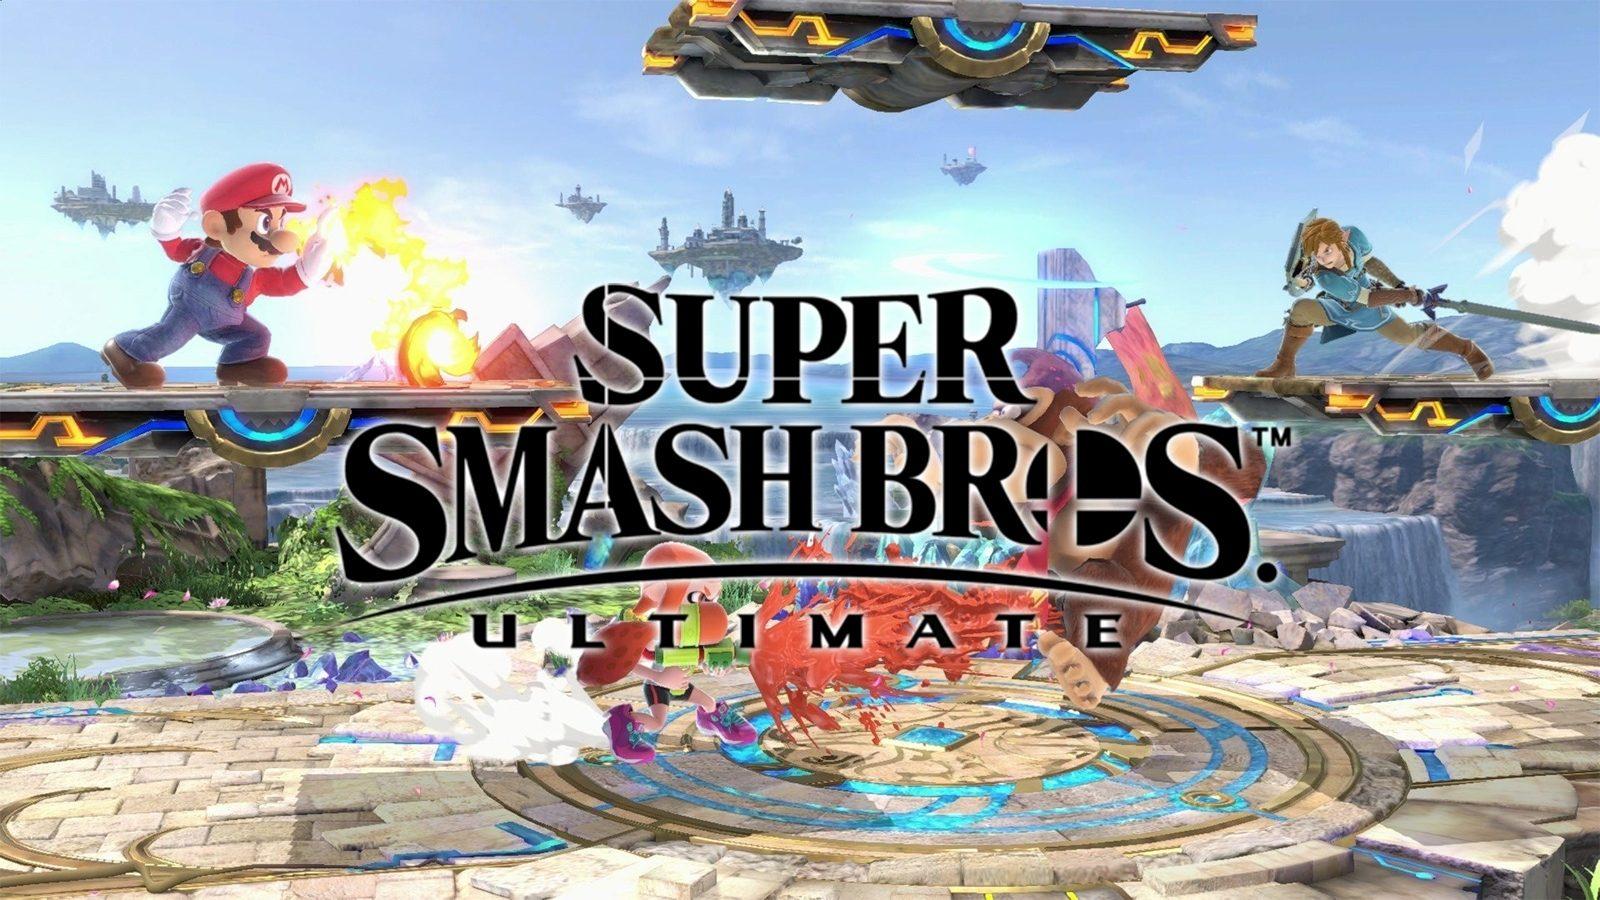 Hoy se revela el personaje final de Super Smash Bros Ultimate, GamersRD